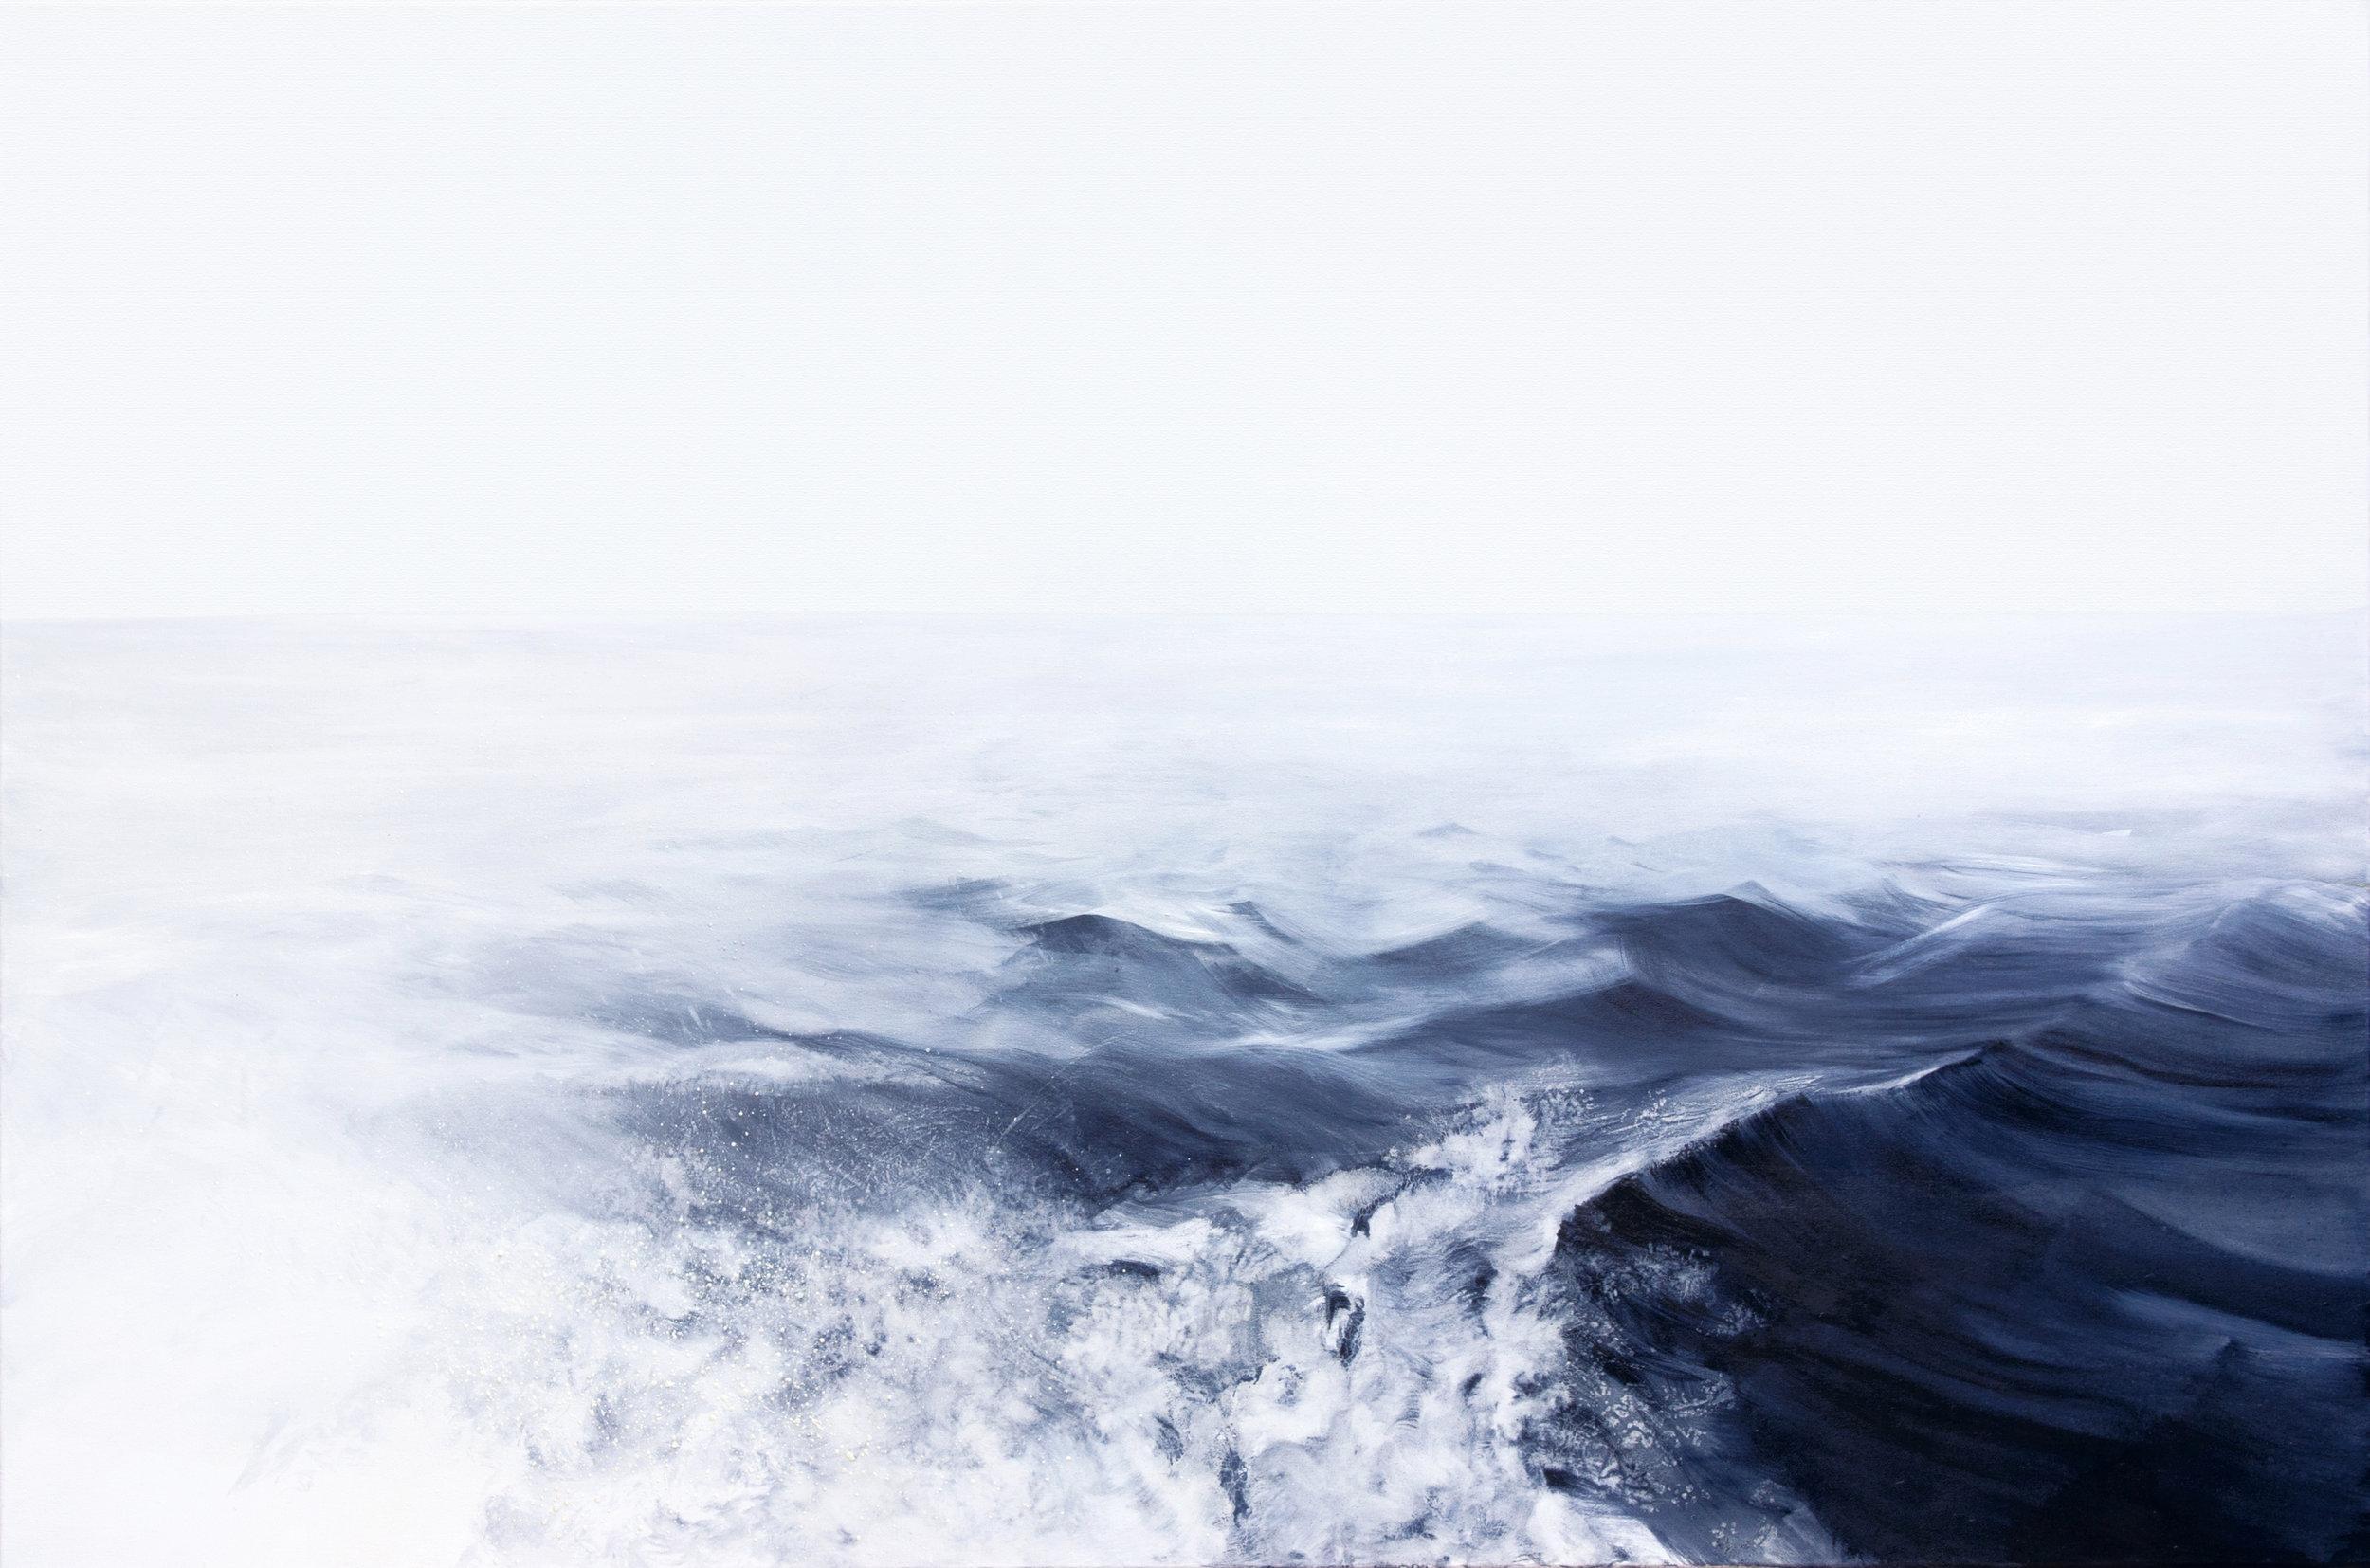 Blue Black. Sea, oil on canvas, 180x120cm, 2015